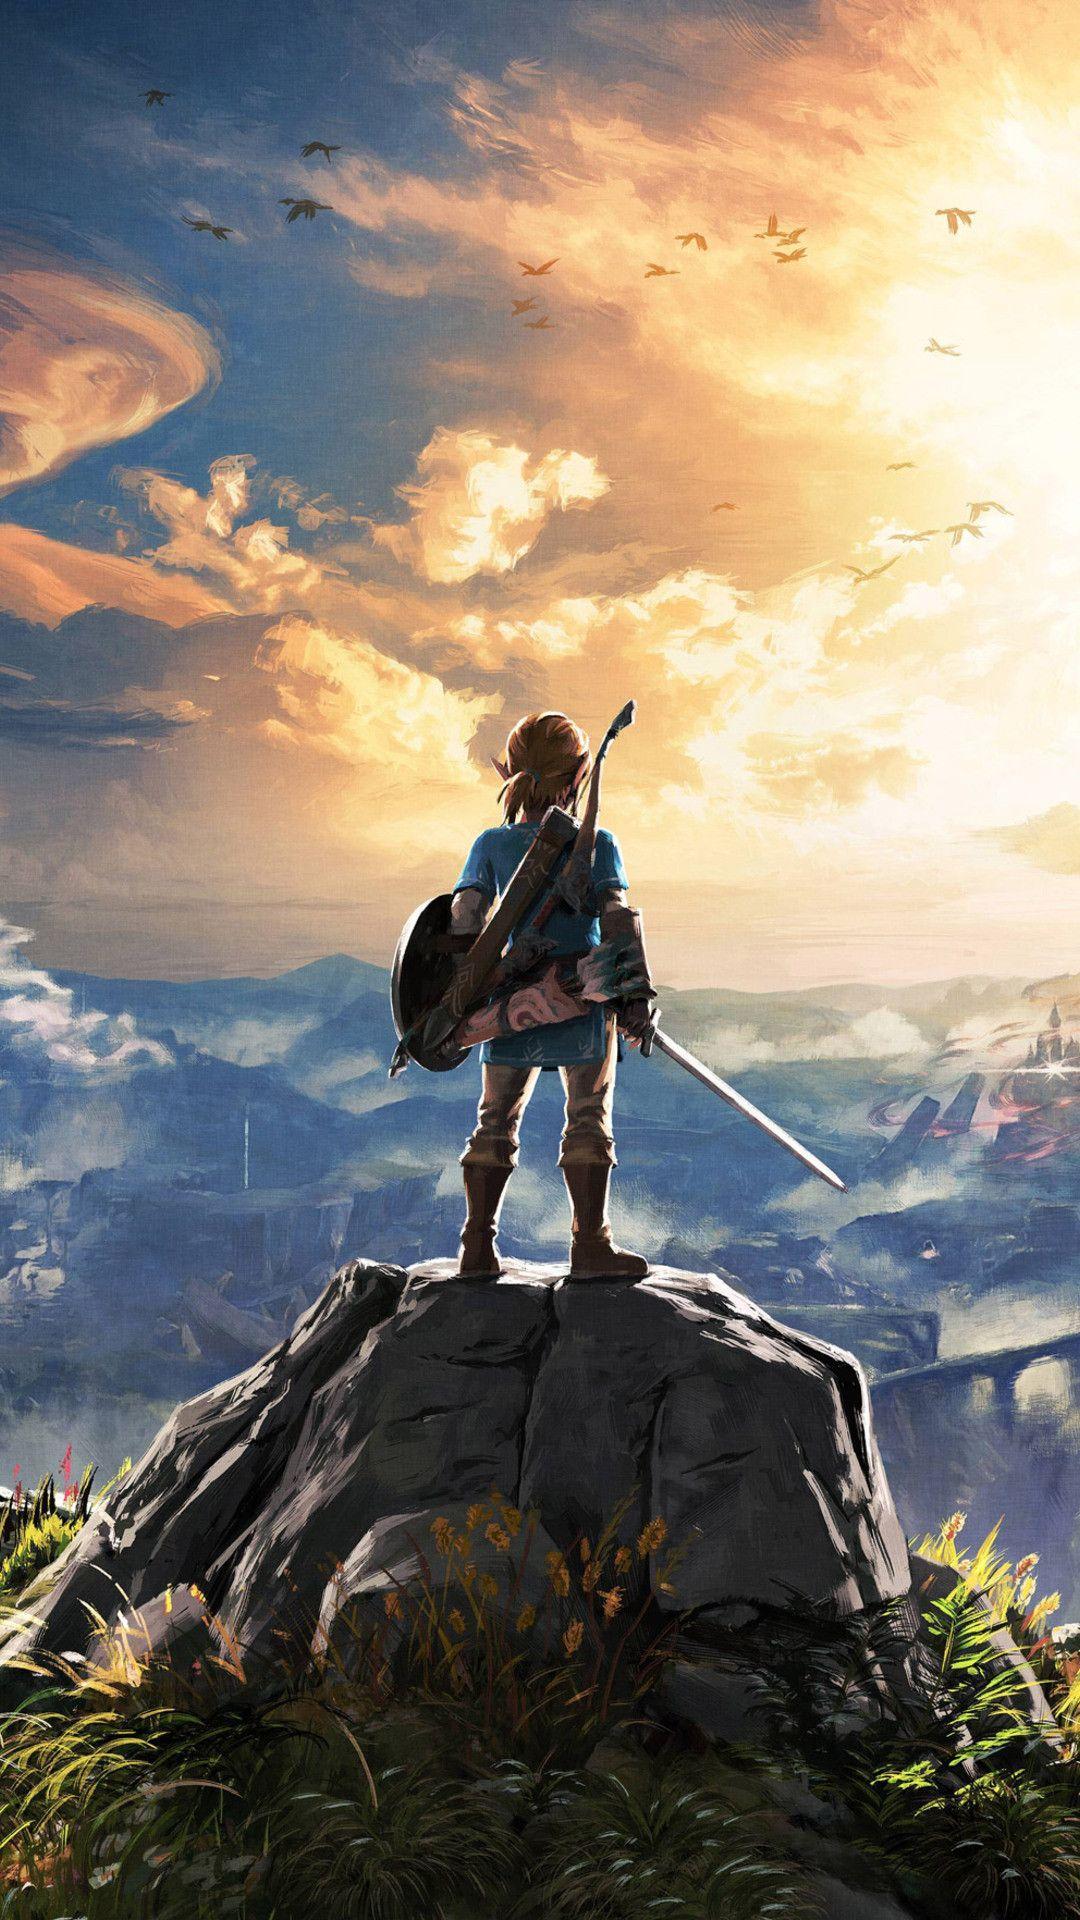 The Legend Of Zelda Iphone Wallpapers Top Free The Legend Of